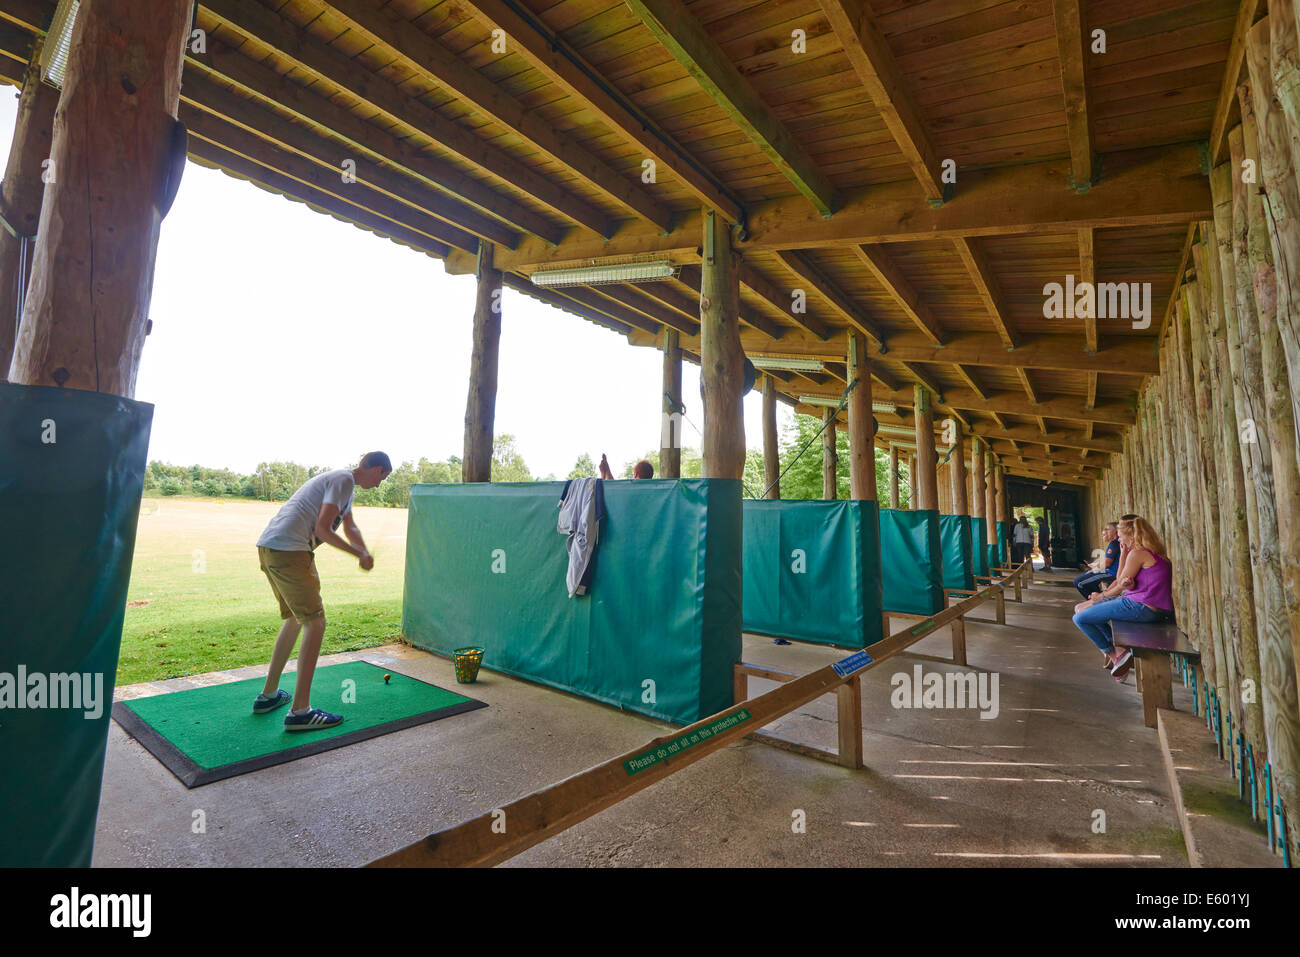 Inside A Golf Driving Range Center Parcs Sherwood Forest UK - Stock Image